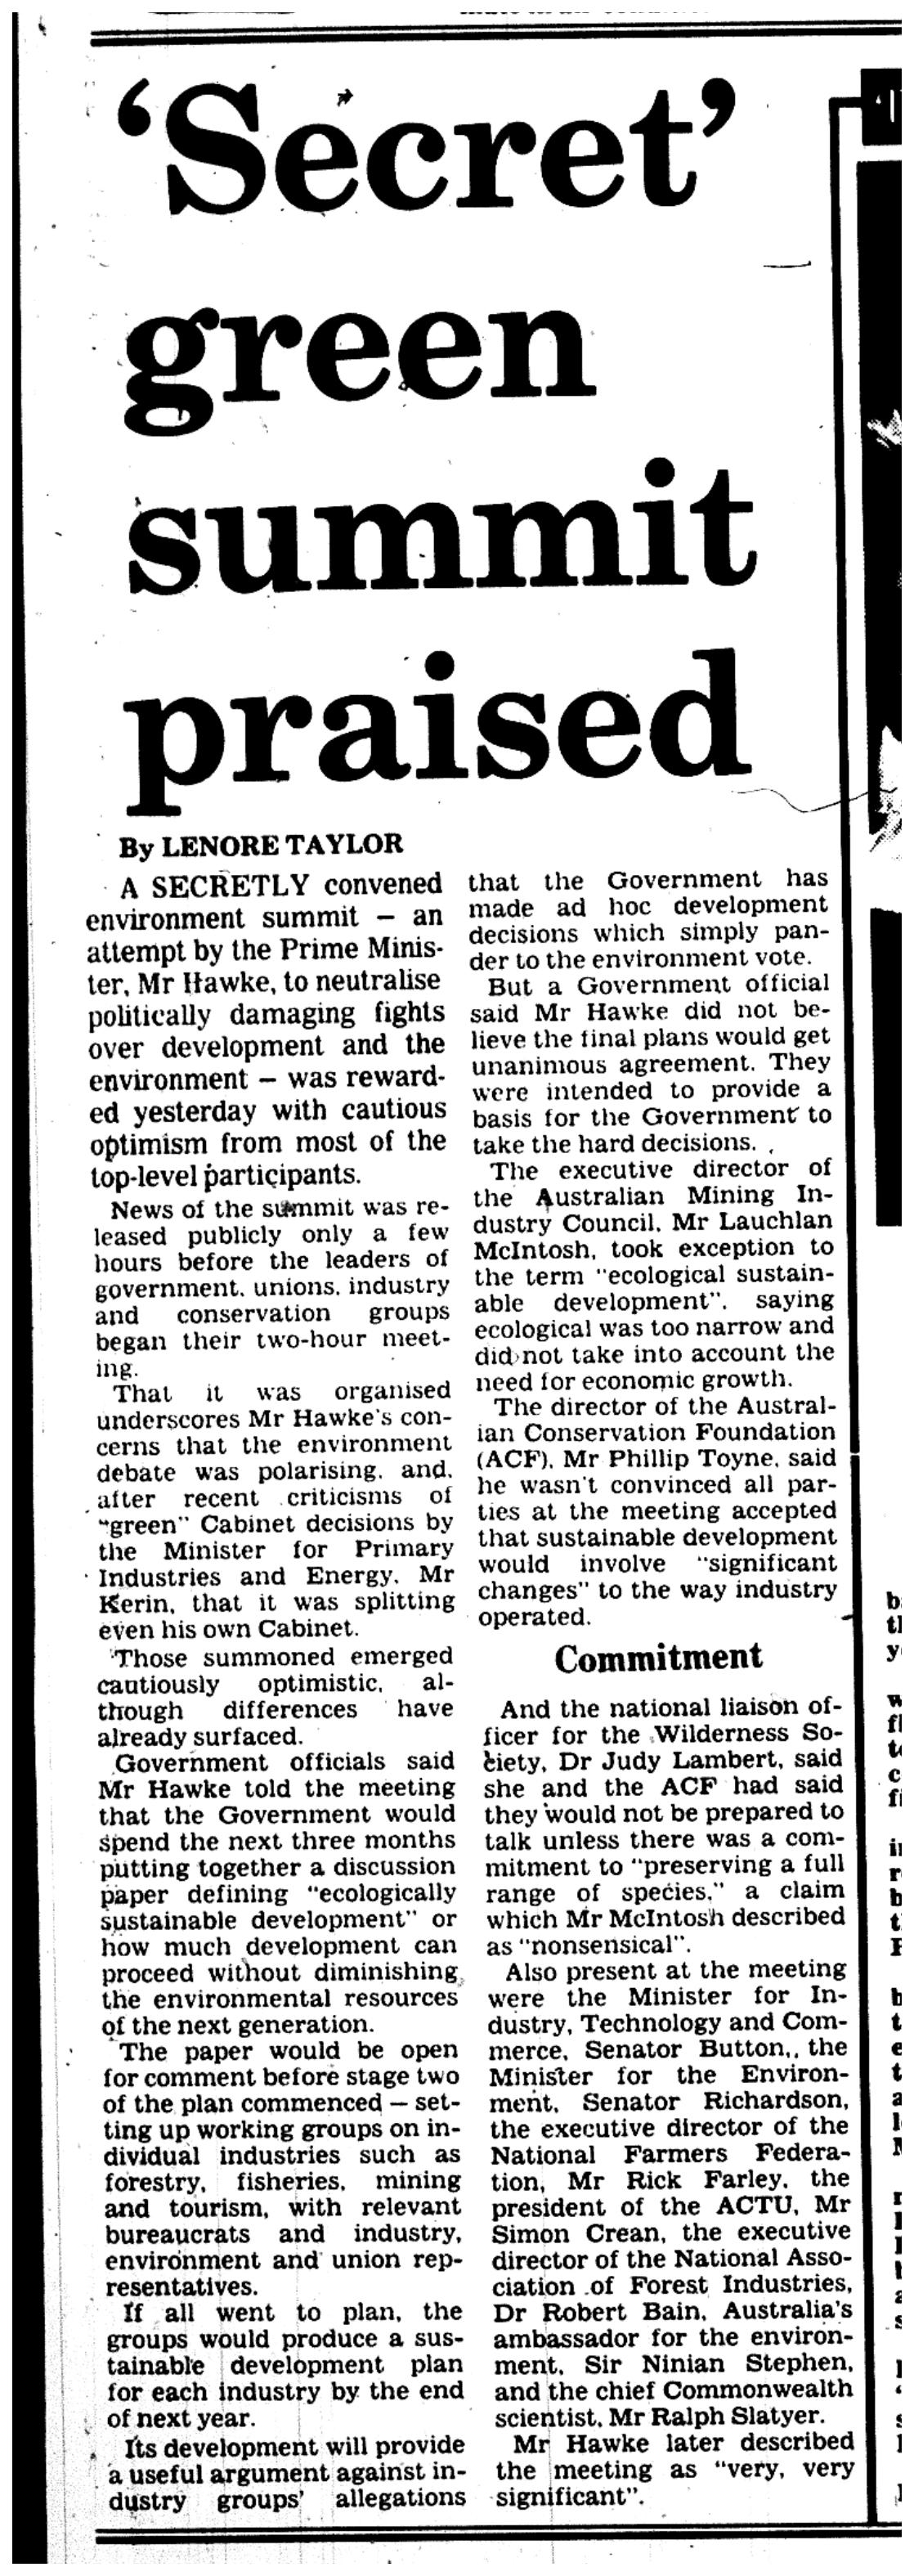 1989 12 08 secret green summit praised theaus p3.png